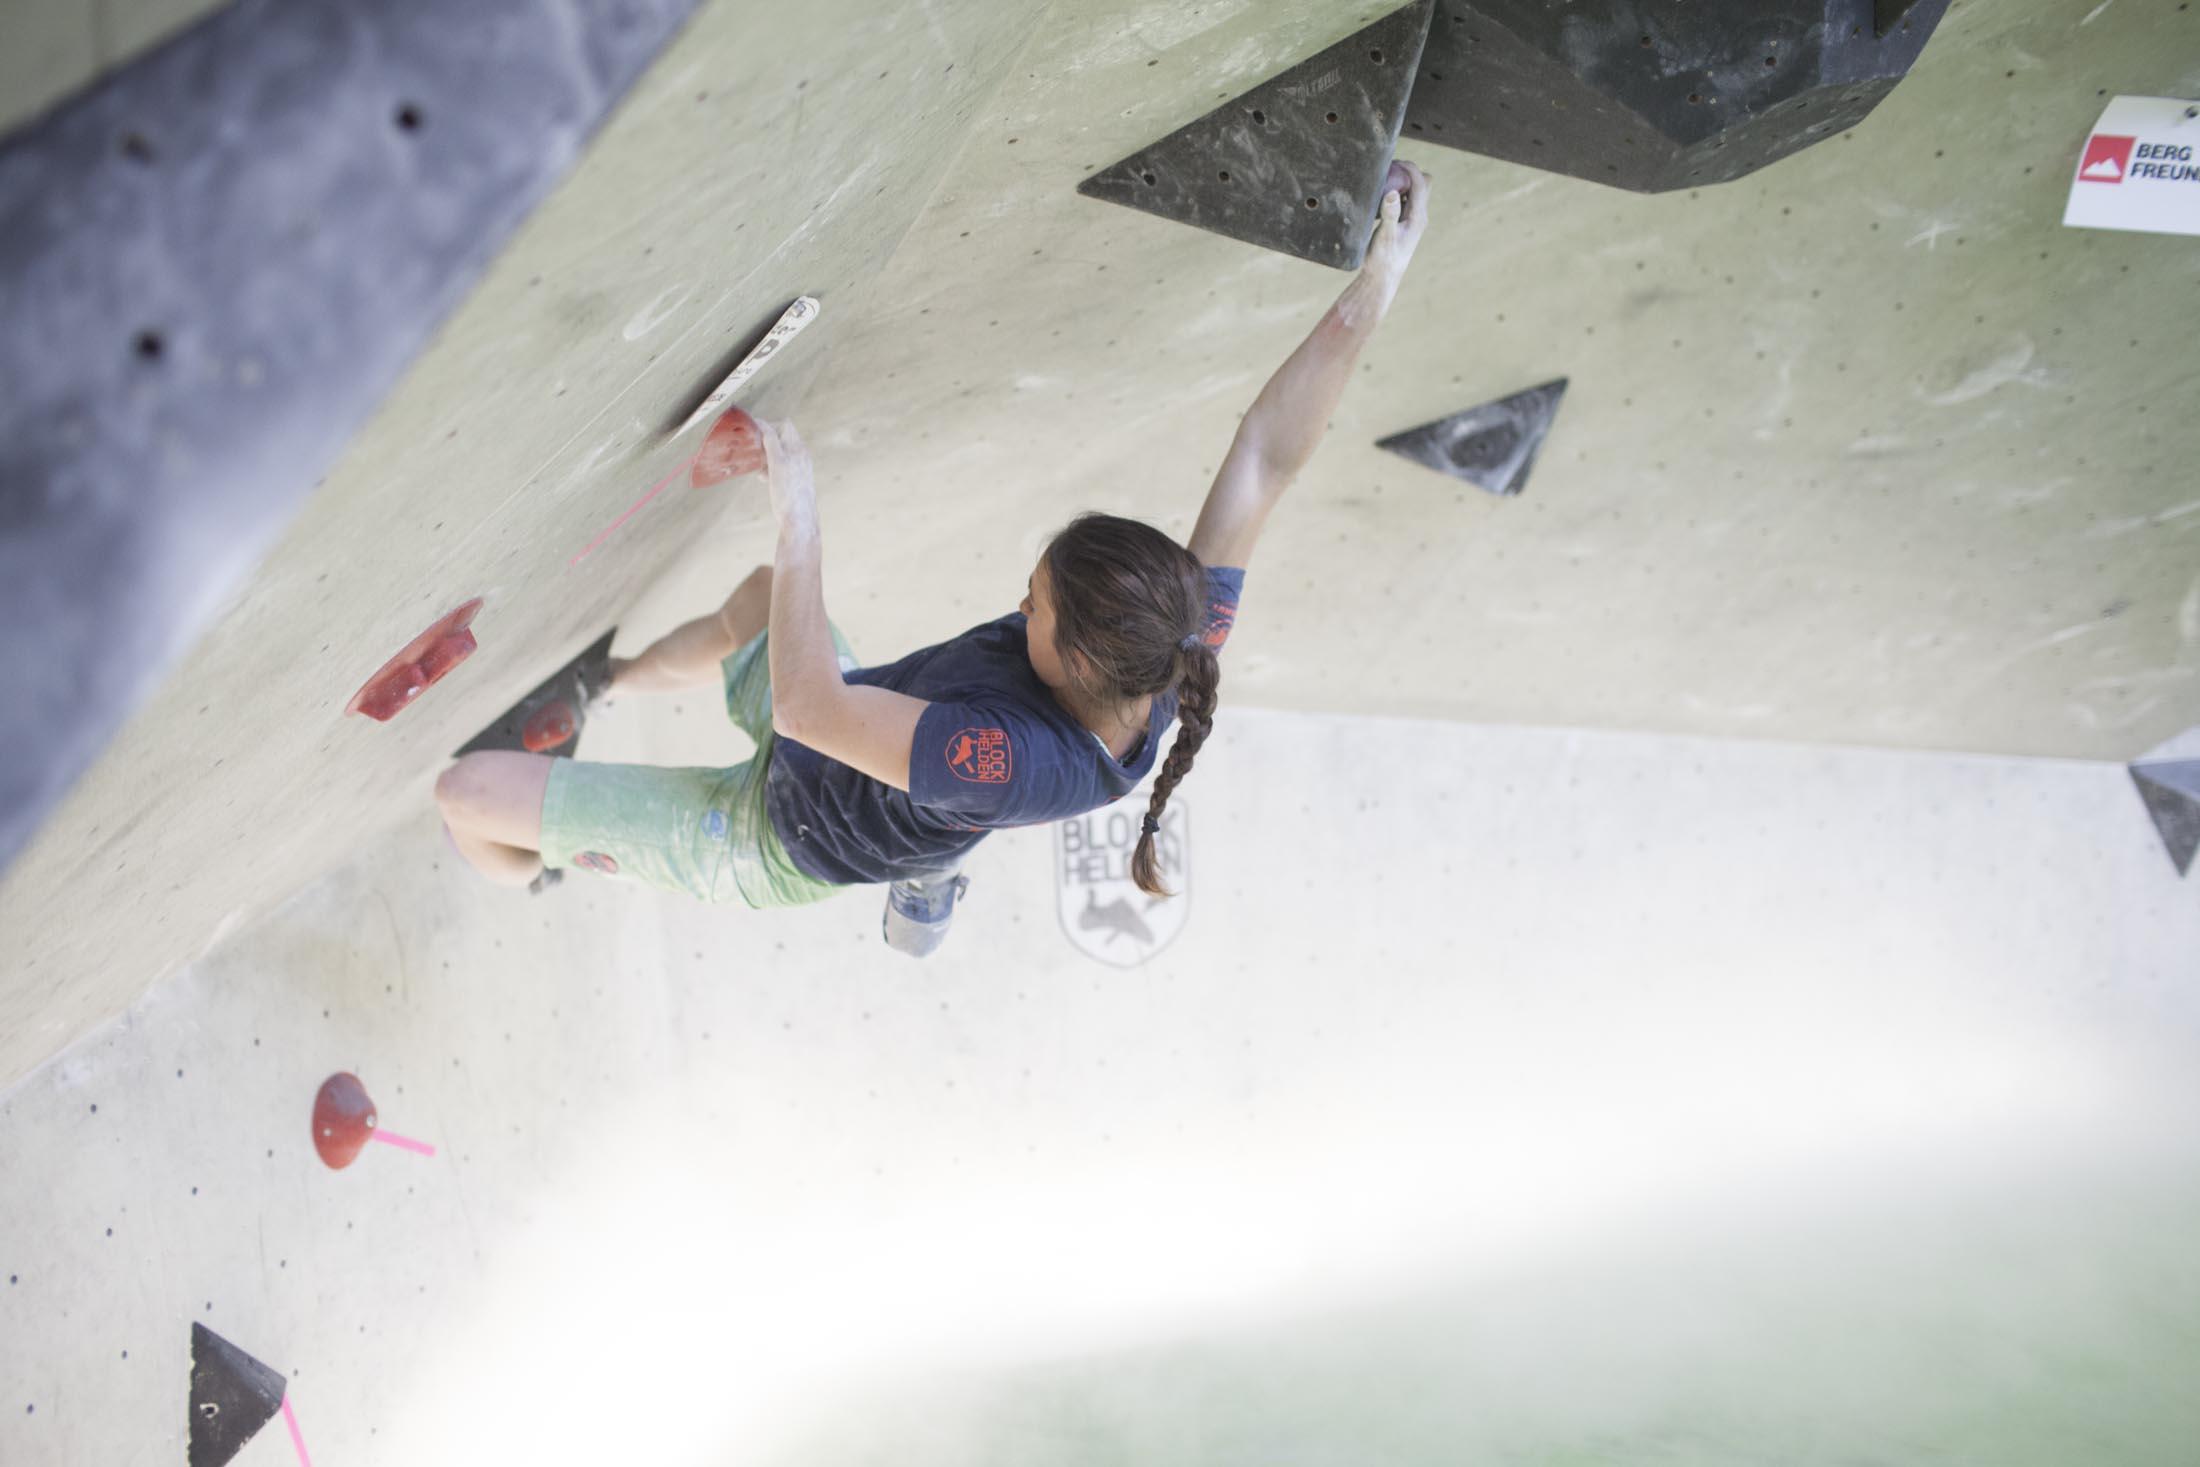 Juliane Wurm, internationaler bouldercup Frankenjura, BLOCKHELDEN Erlangen, Bergfreunde.de, Mammut07092016048